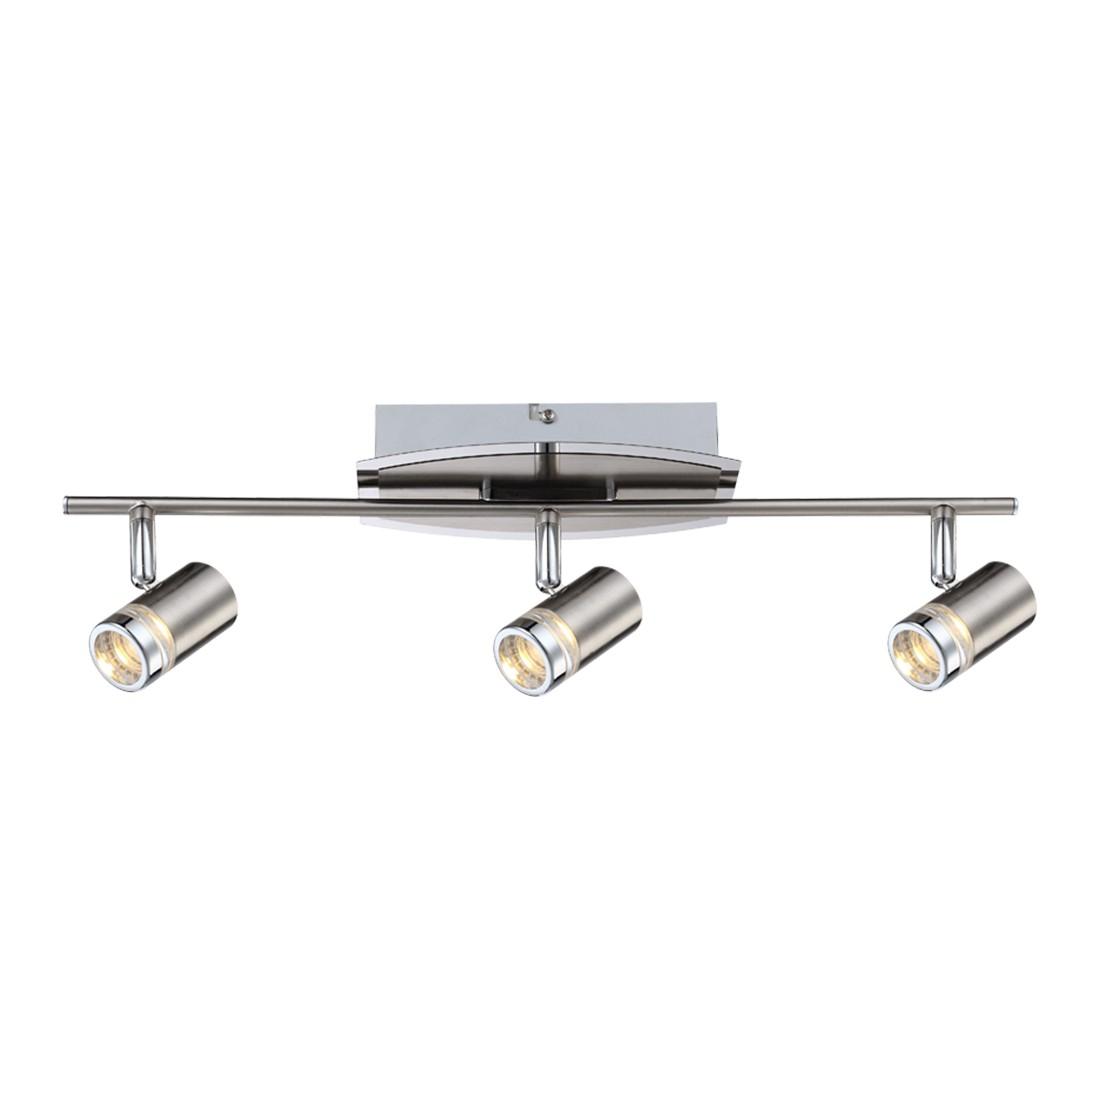 Deckenleuchte DL – Metall/Acryl – 3-flammig, Globo Lighting günstig bestellen